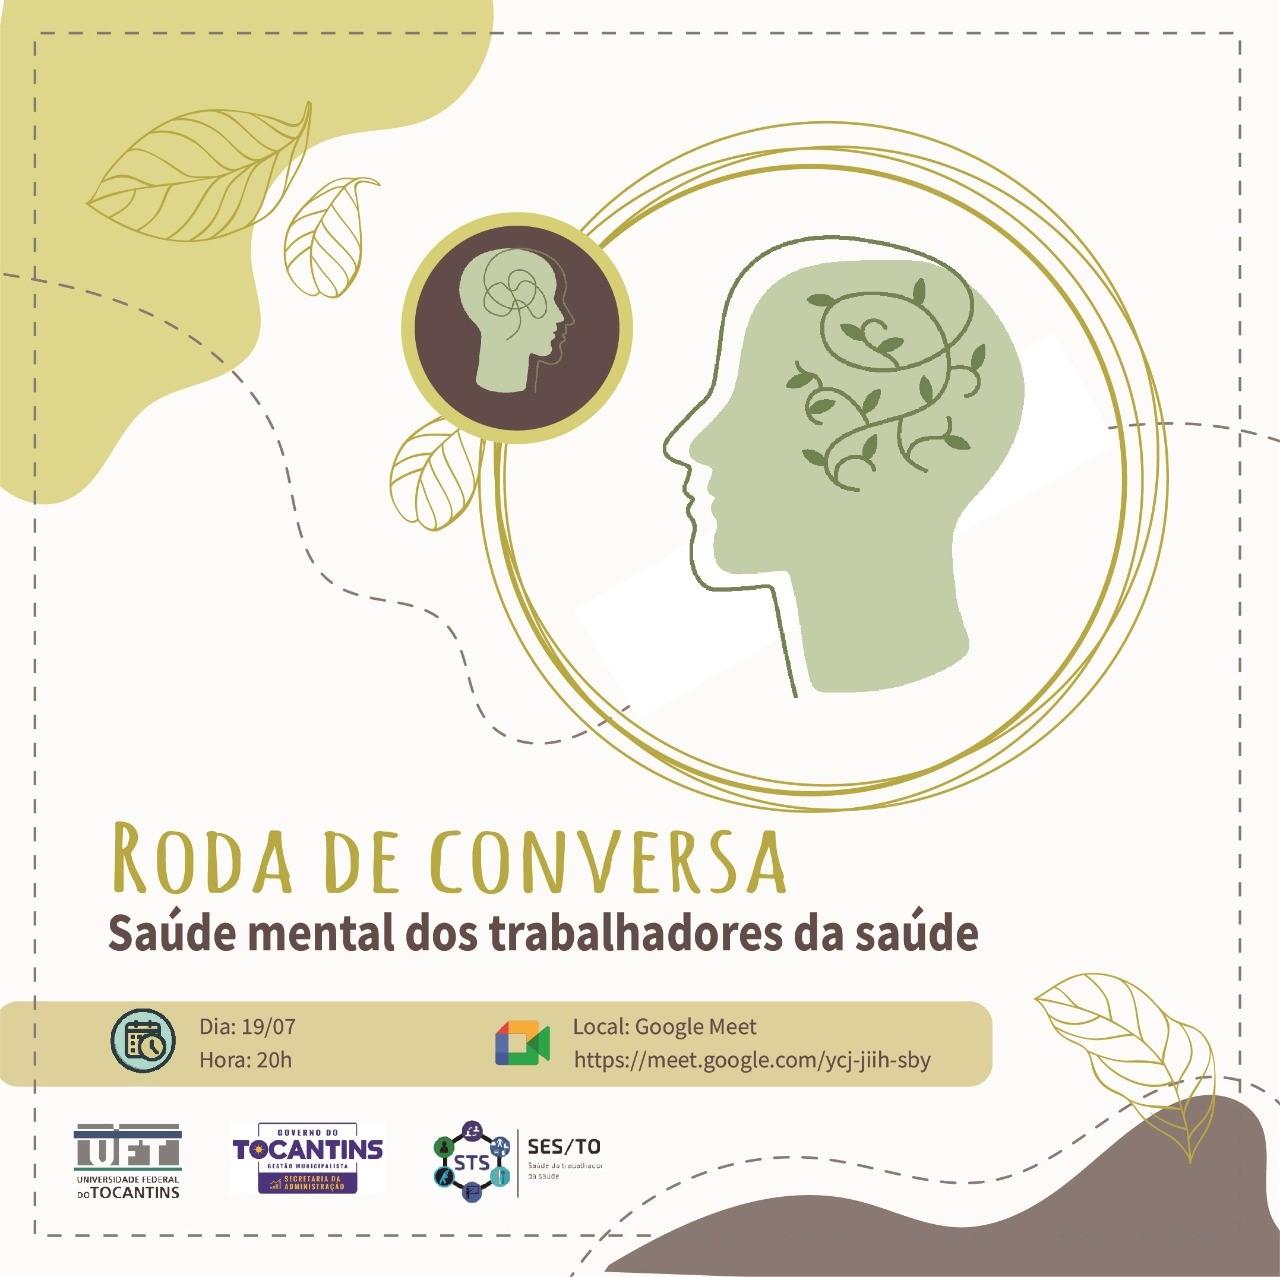 Projeto de psicologia on-line da SES, promove rodas virtuais de conversa para servidores